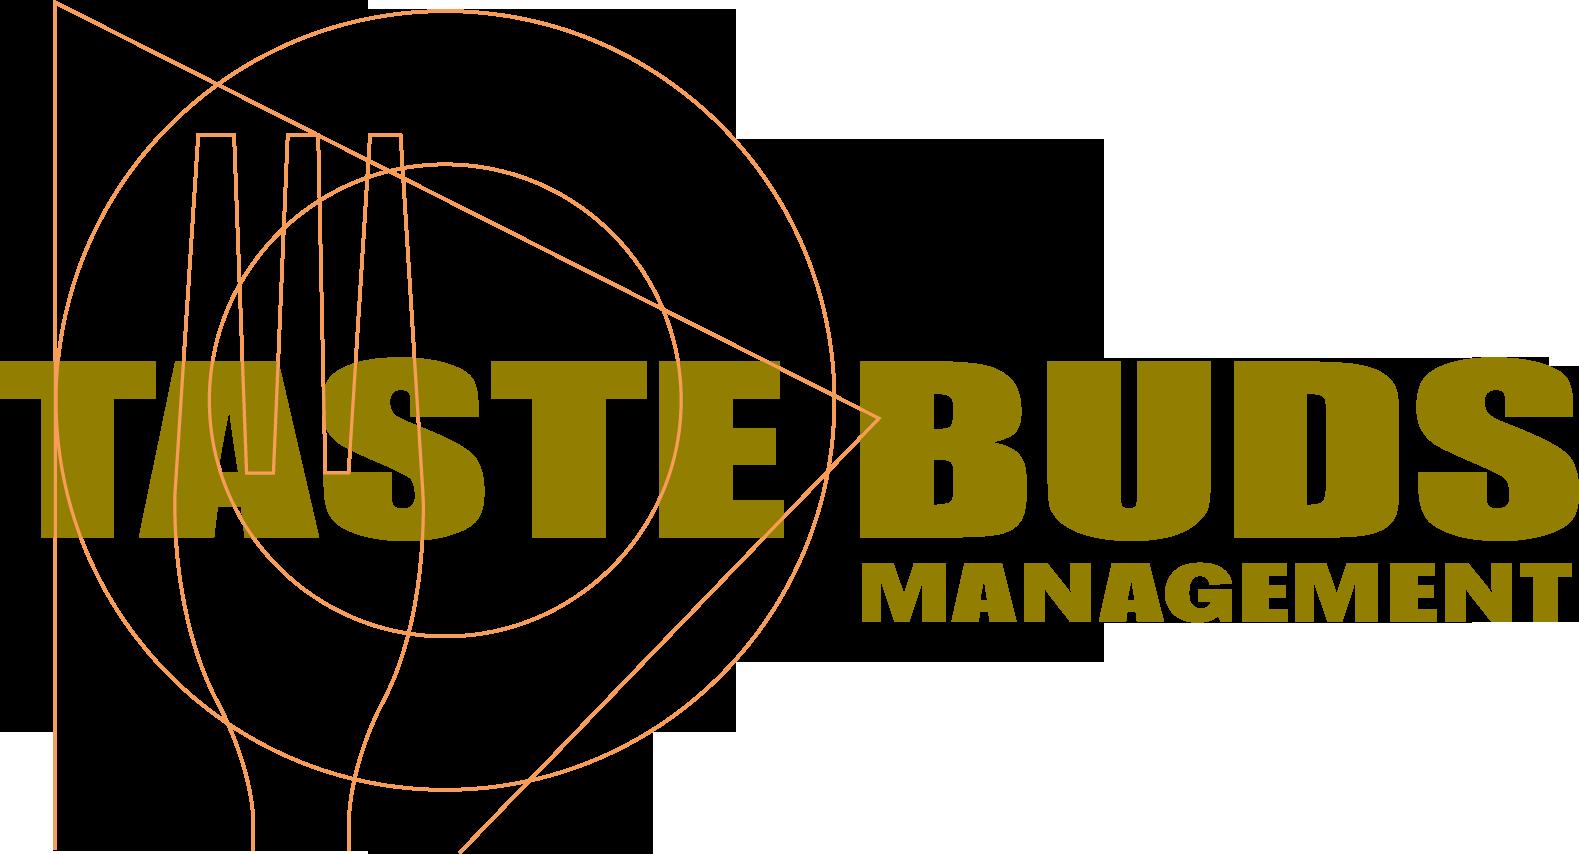 Taste Buds Management, LLC logo